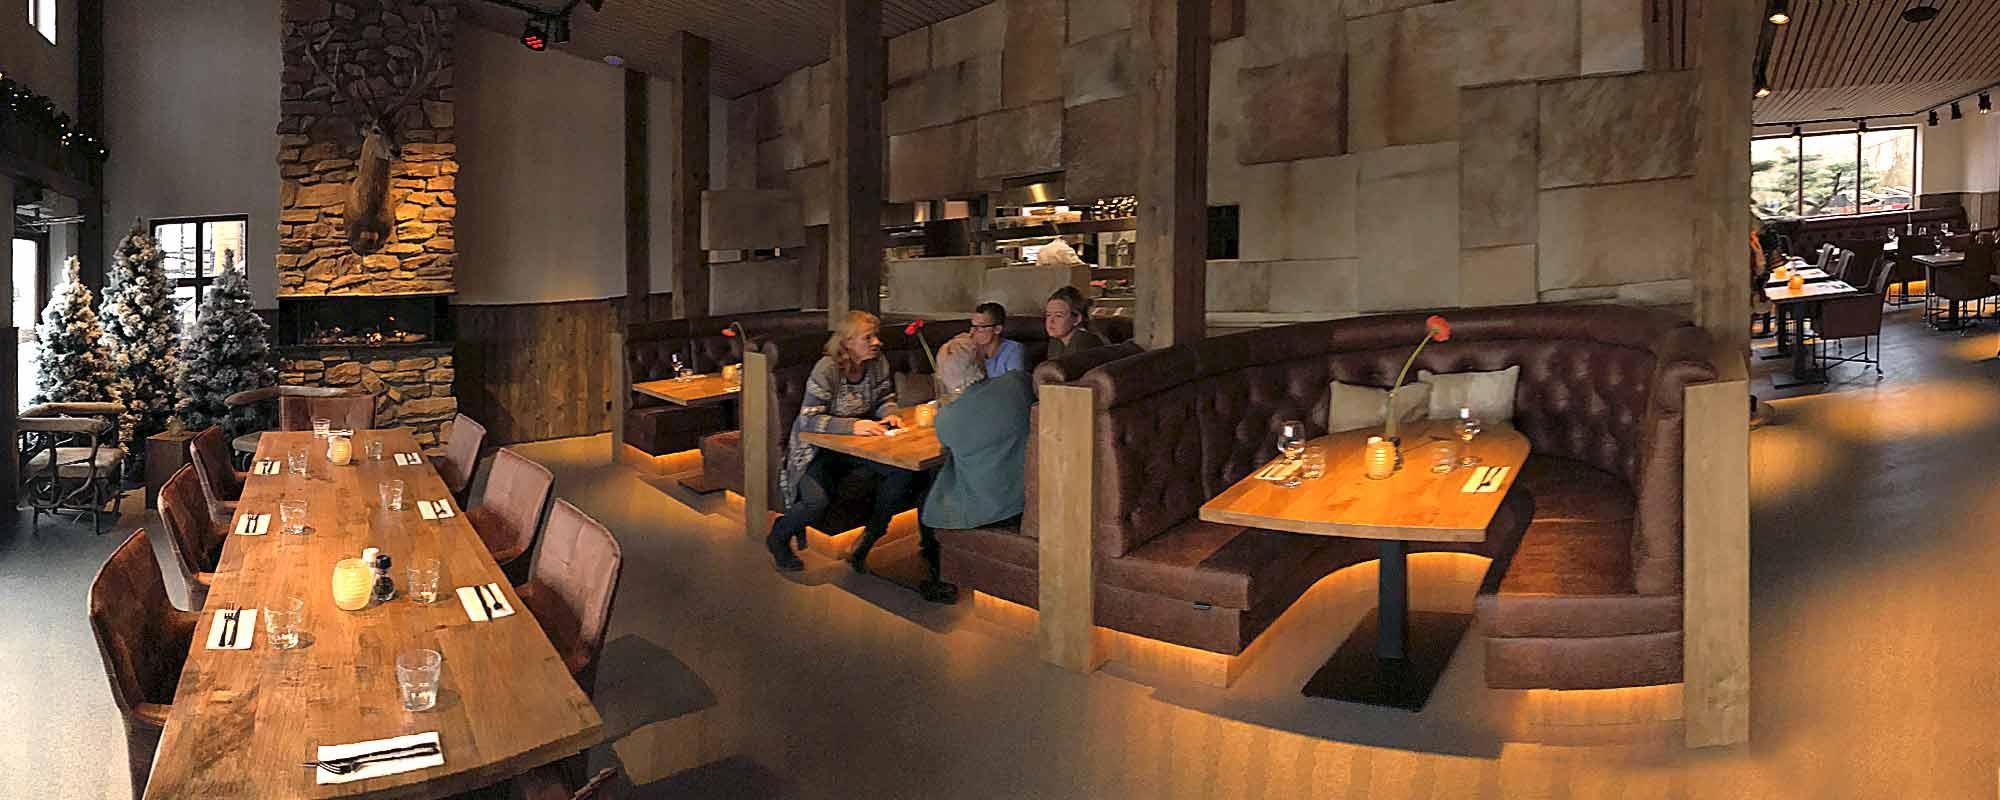 Restaurant Partycentrum Feestlocatie